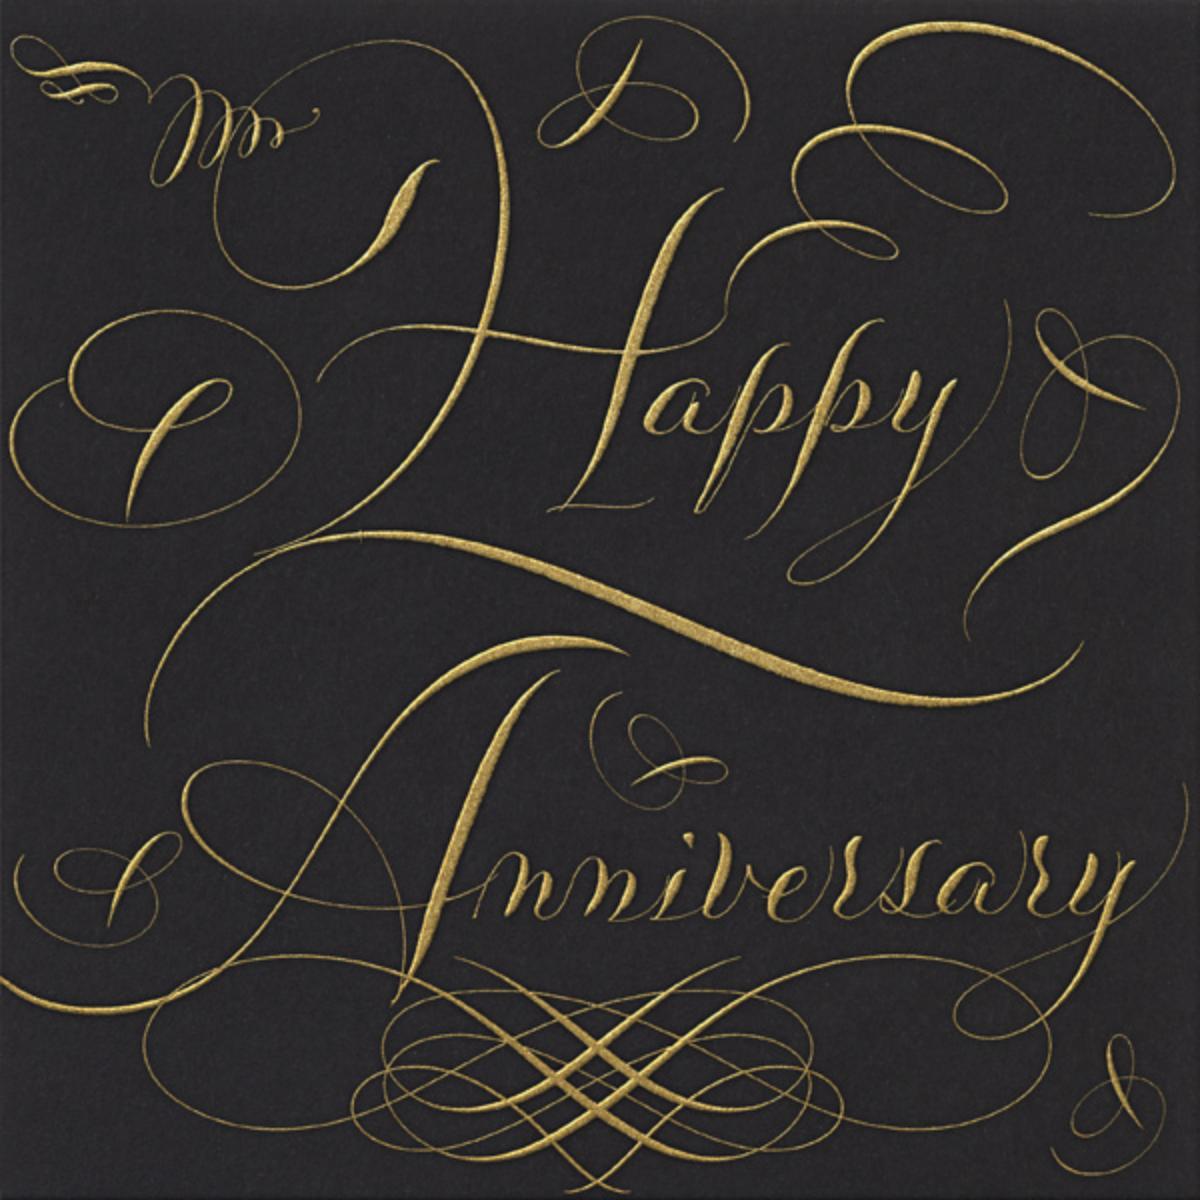 Happy Anniversary Script - Black and Gold - Bernard Maisner - Anniversary cards